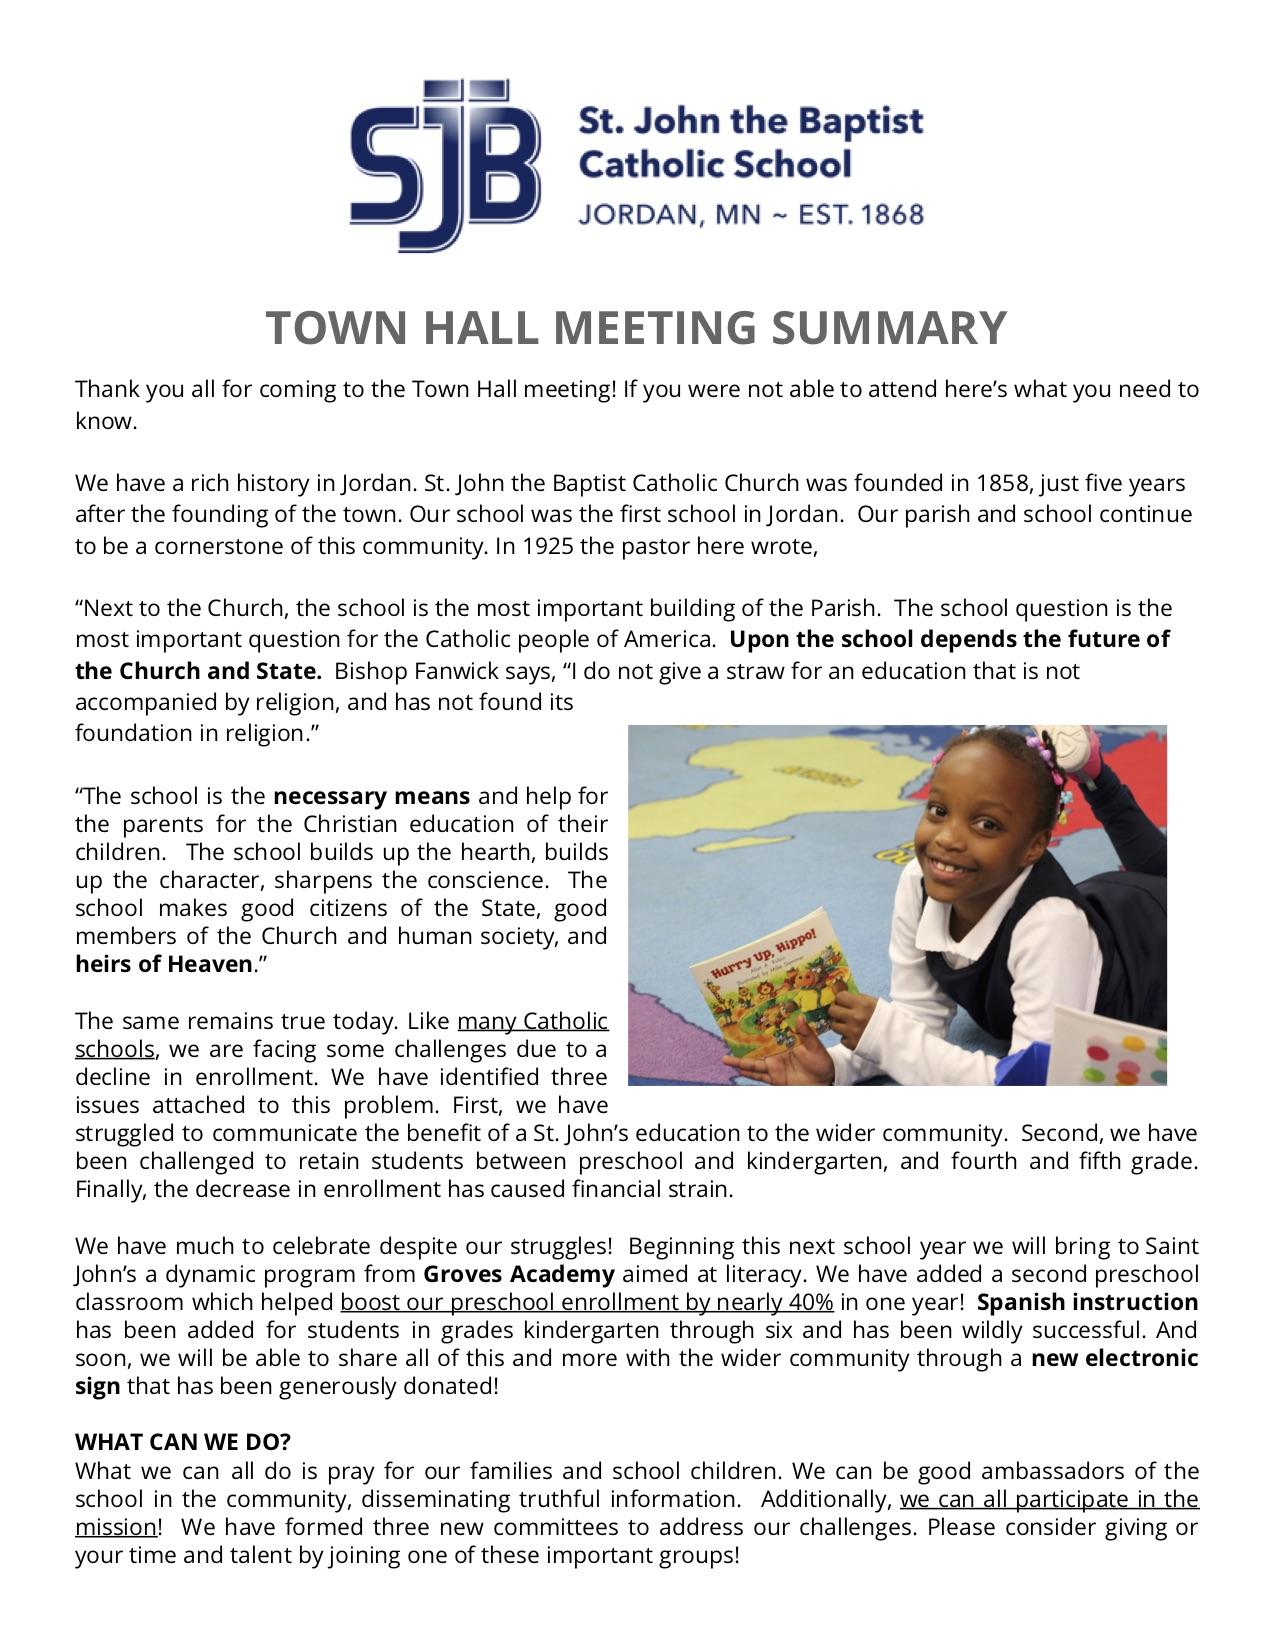 Town Hall Bulletin Article - Google Docs1.jpg